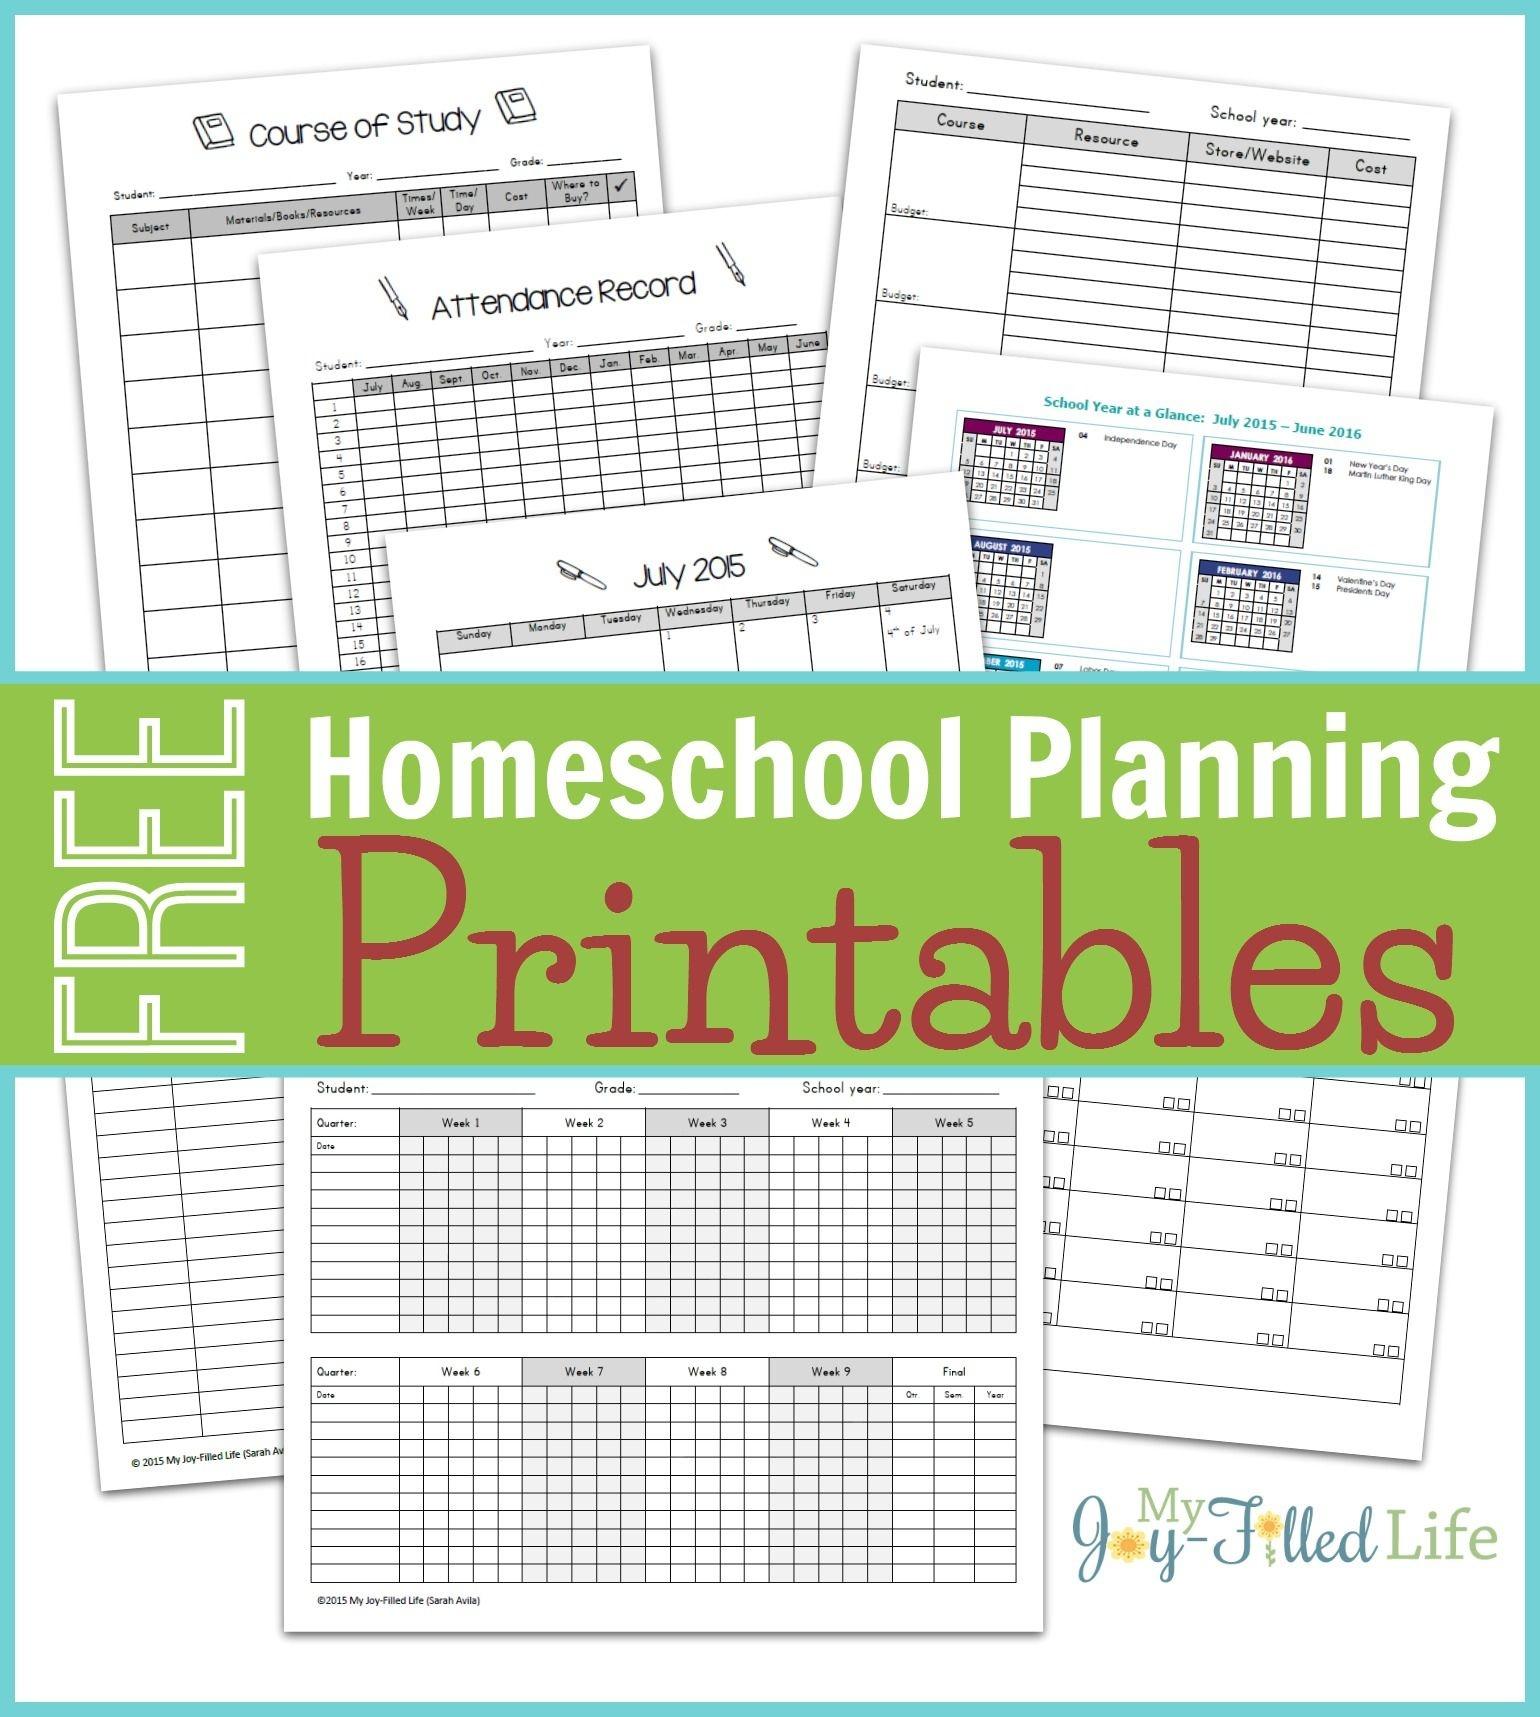 Homeschool Planning Resources & Free Printable Planning Pages - Free Printable Attendance Sheets For Homeschool